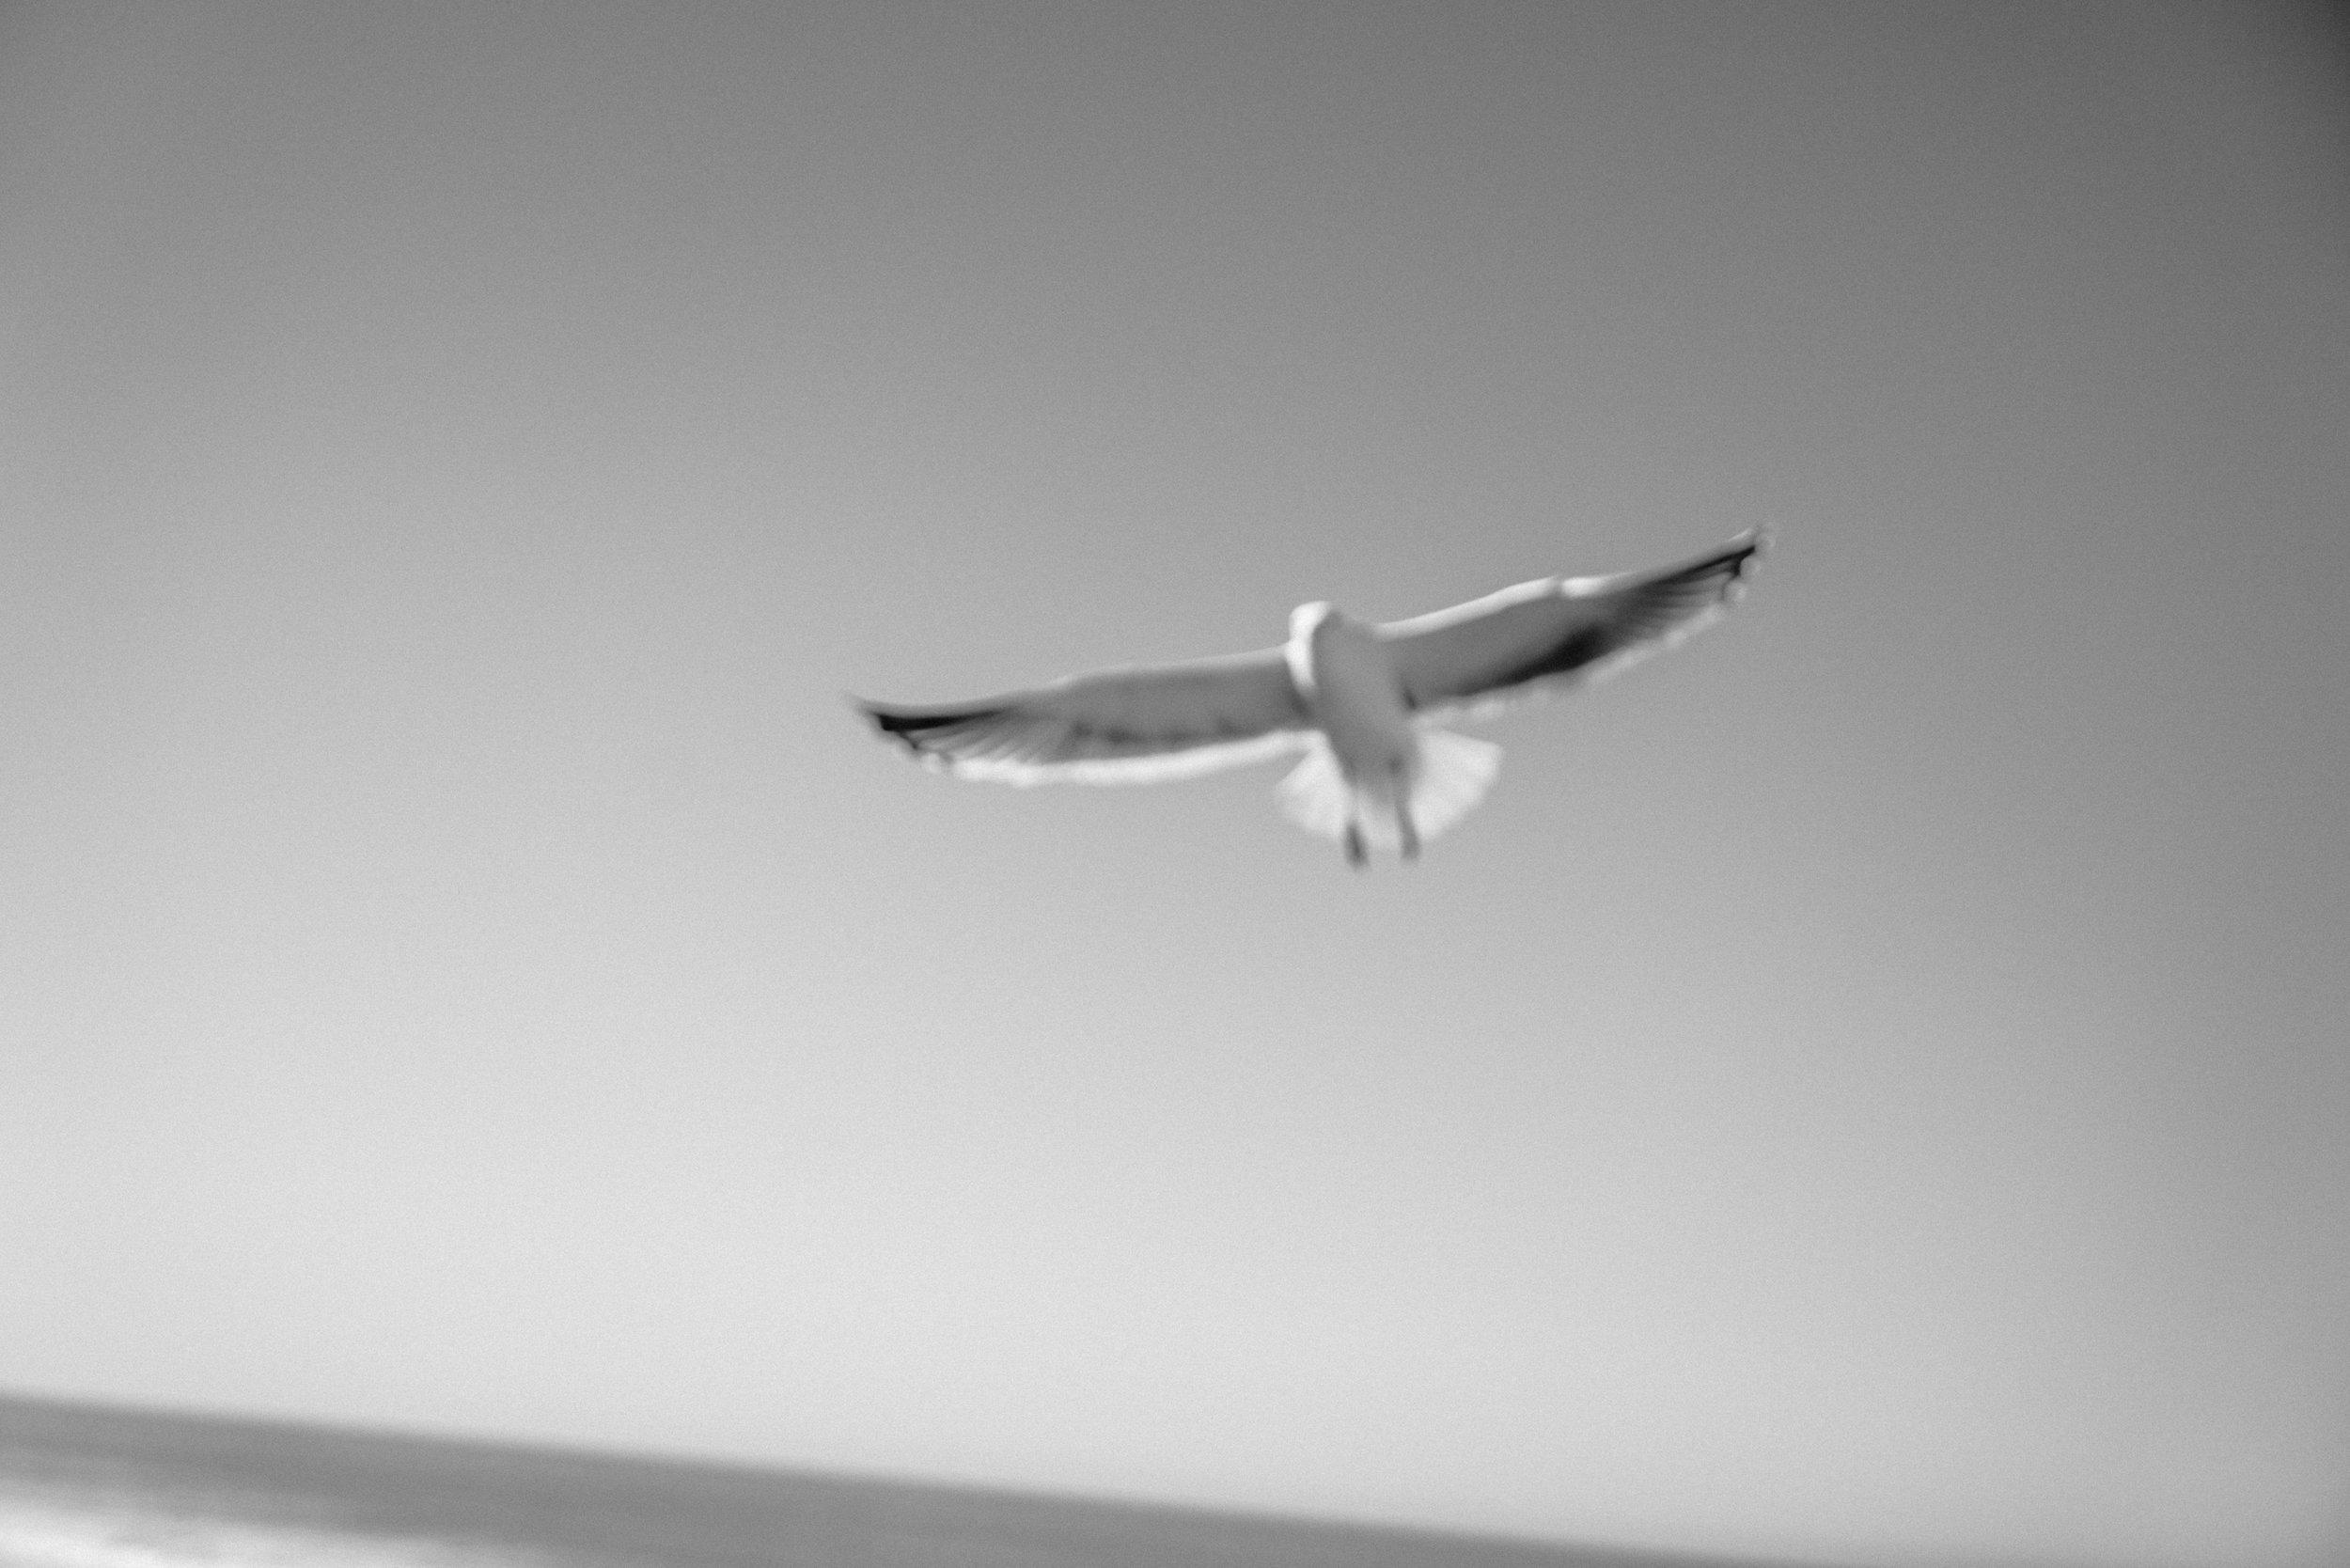 josue-rivas-culture-crush-seagull-pacific-northwest.jpg